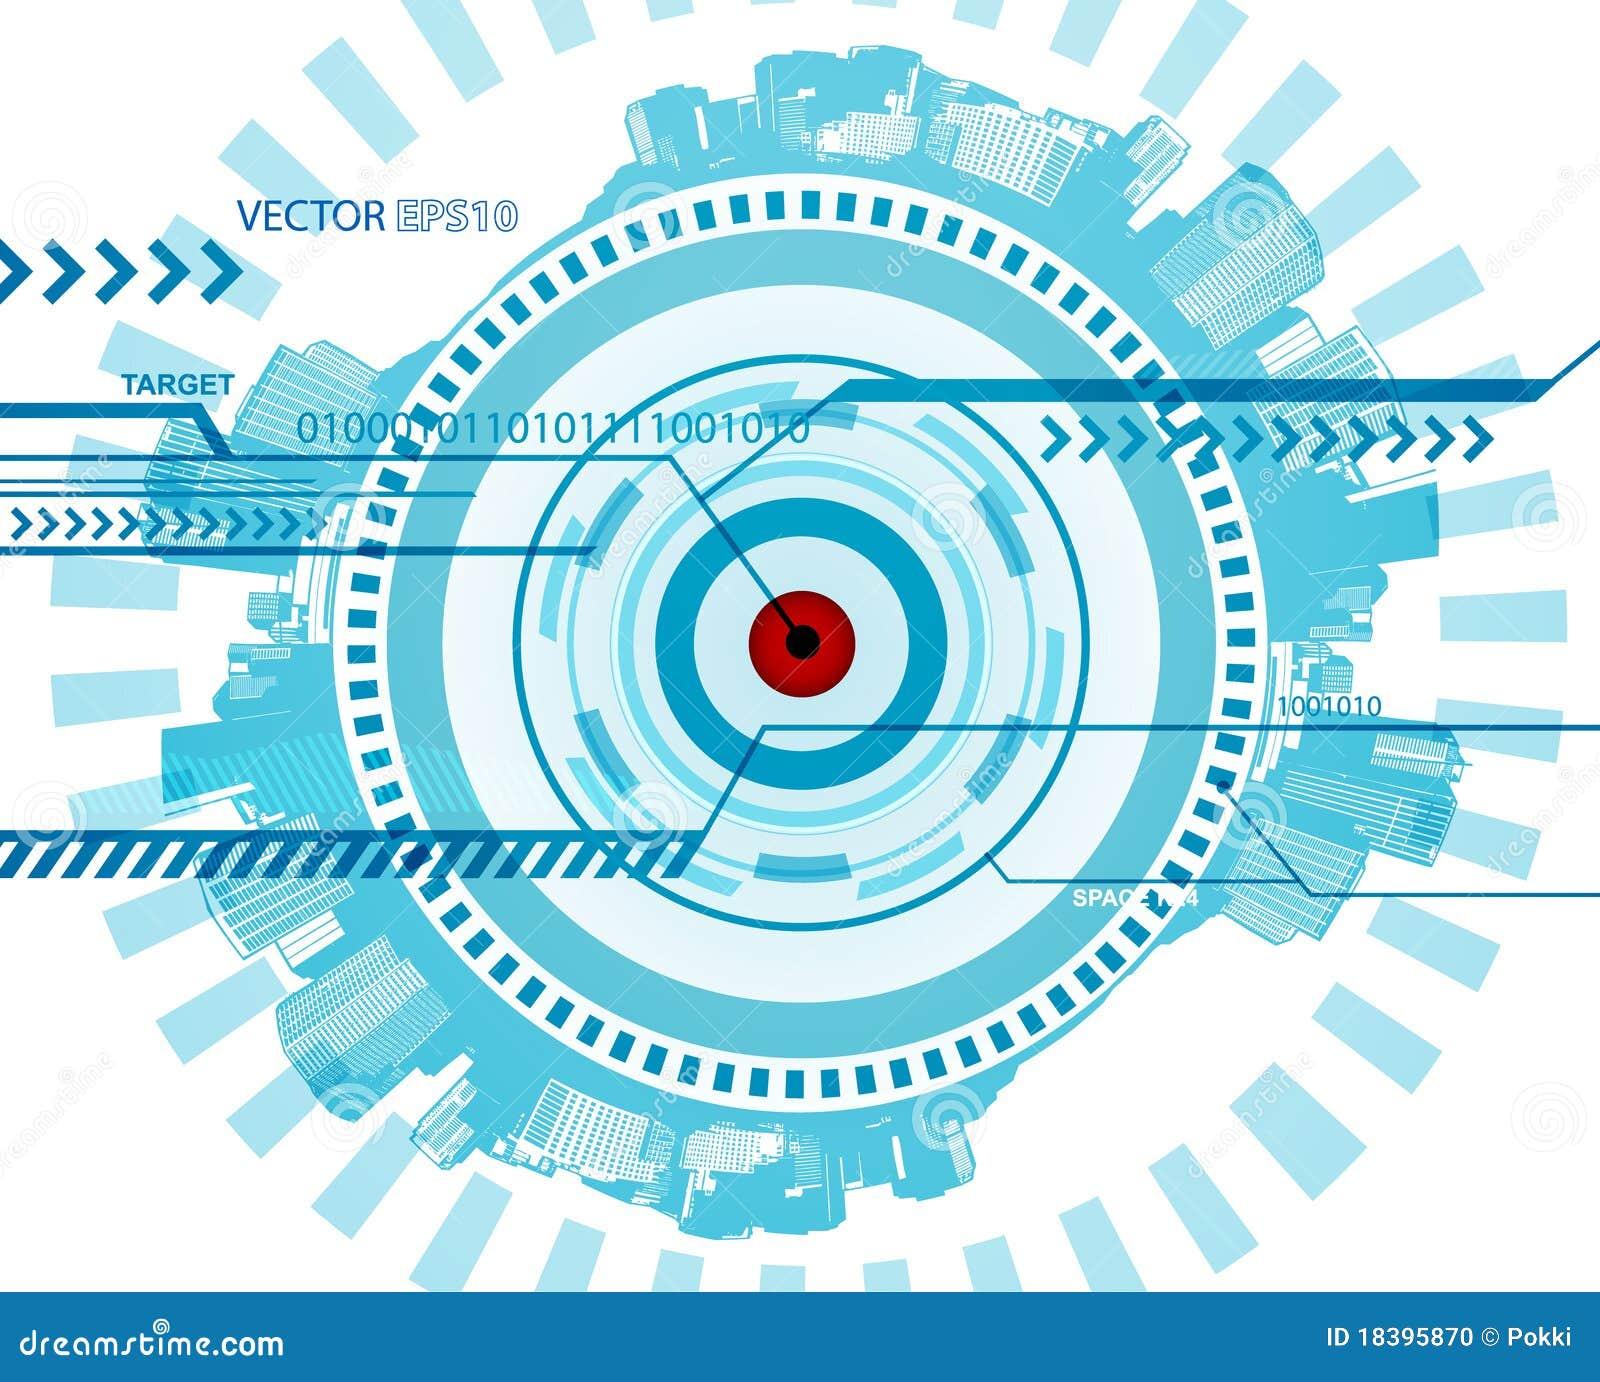 Blue Technology: Abstract Blue Technology Illustration. Stock Photo